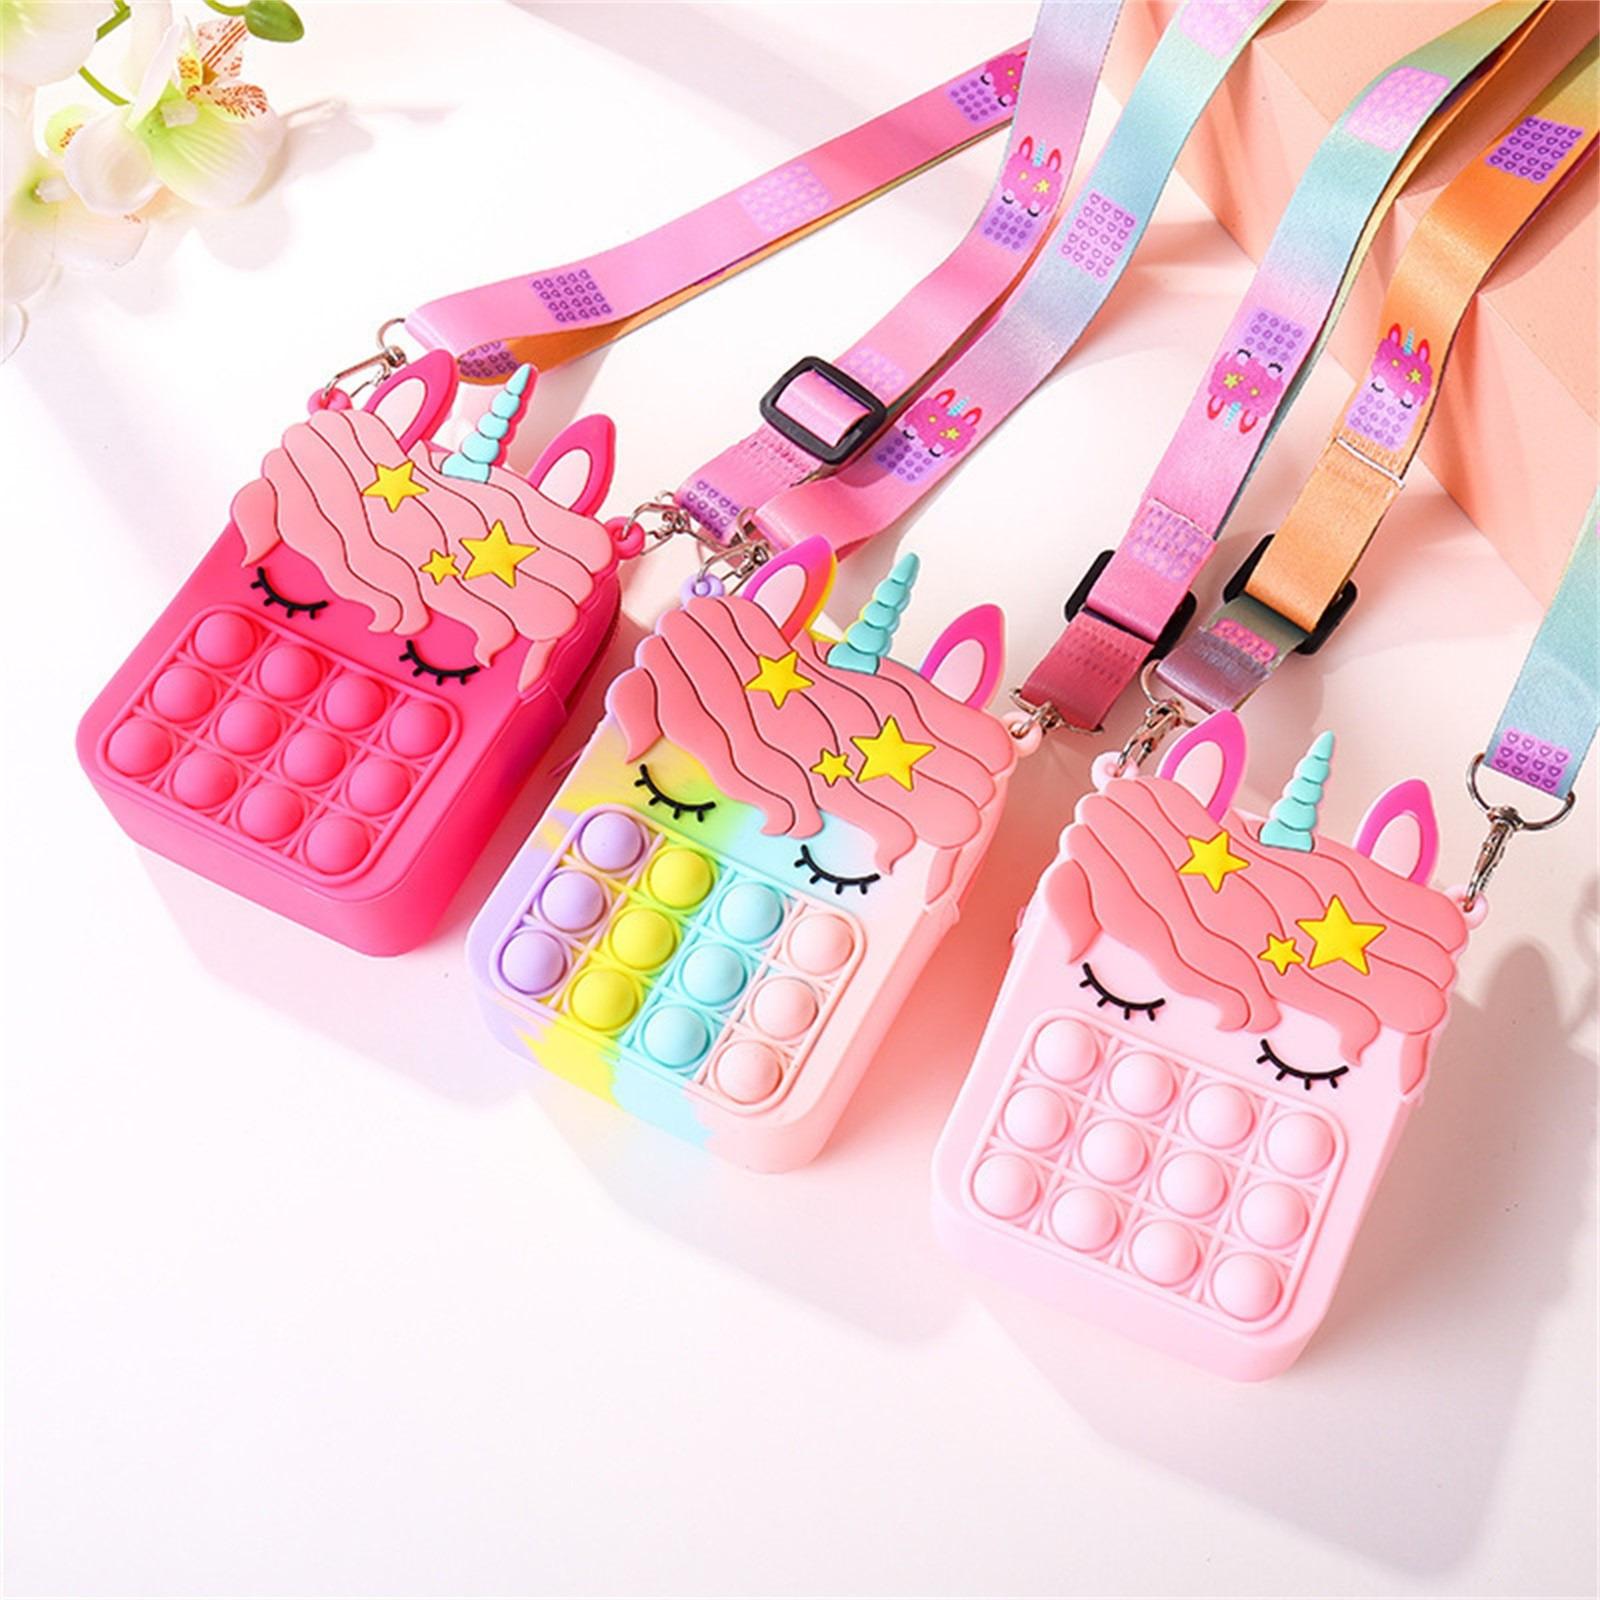 Fashion pop It Push Bubbles Toy Rainbow Unicorn Kawaii Coin Purse Children Wallet Ladies Bag Silica Gel Simple Dimple Fidget Toy